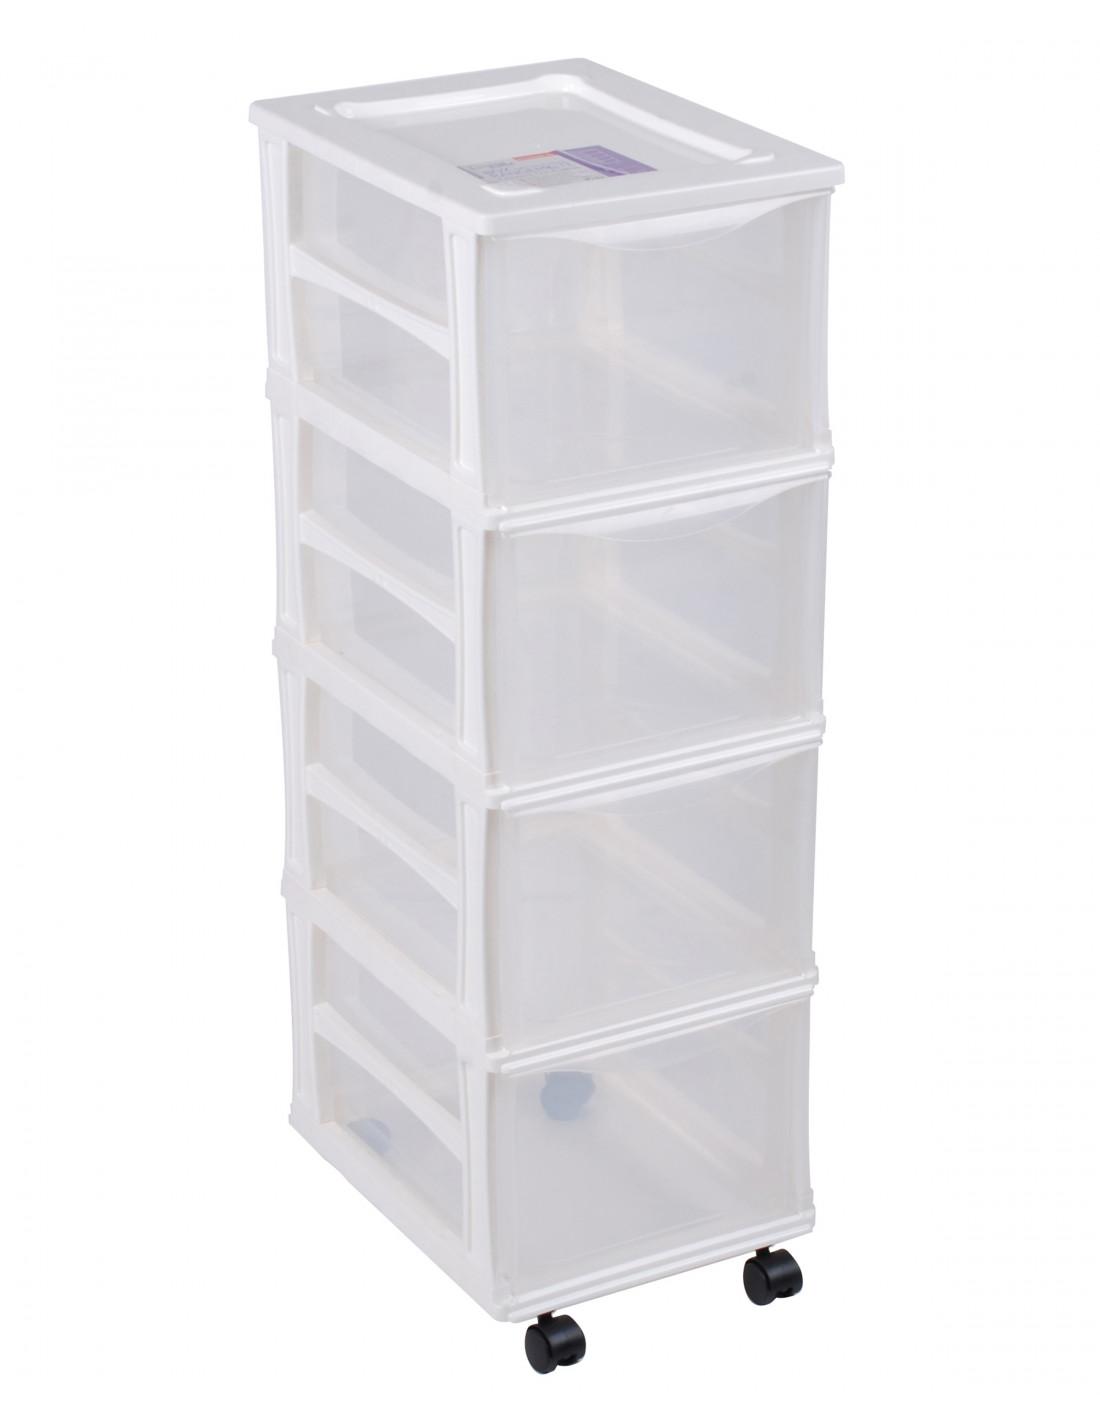 fornord box de rangement roulettes 4 tiroirs transparent bleu hyper brico. Black Bedroom Furniture Sets. Home Design Ideas